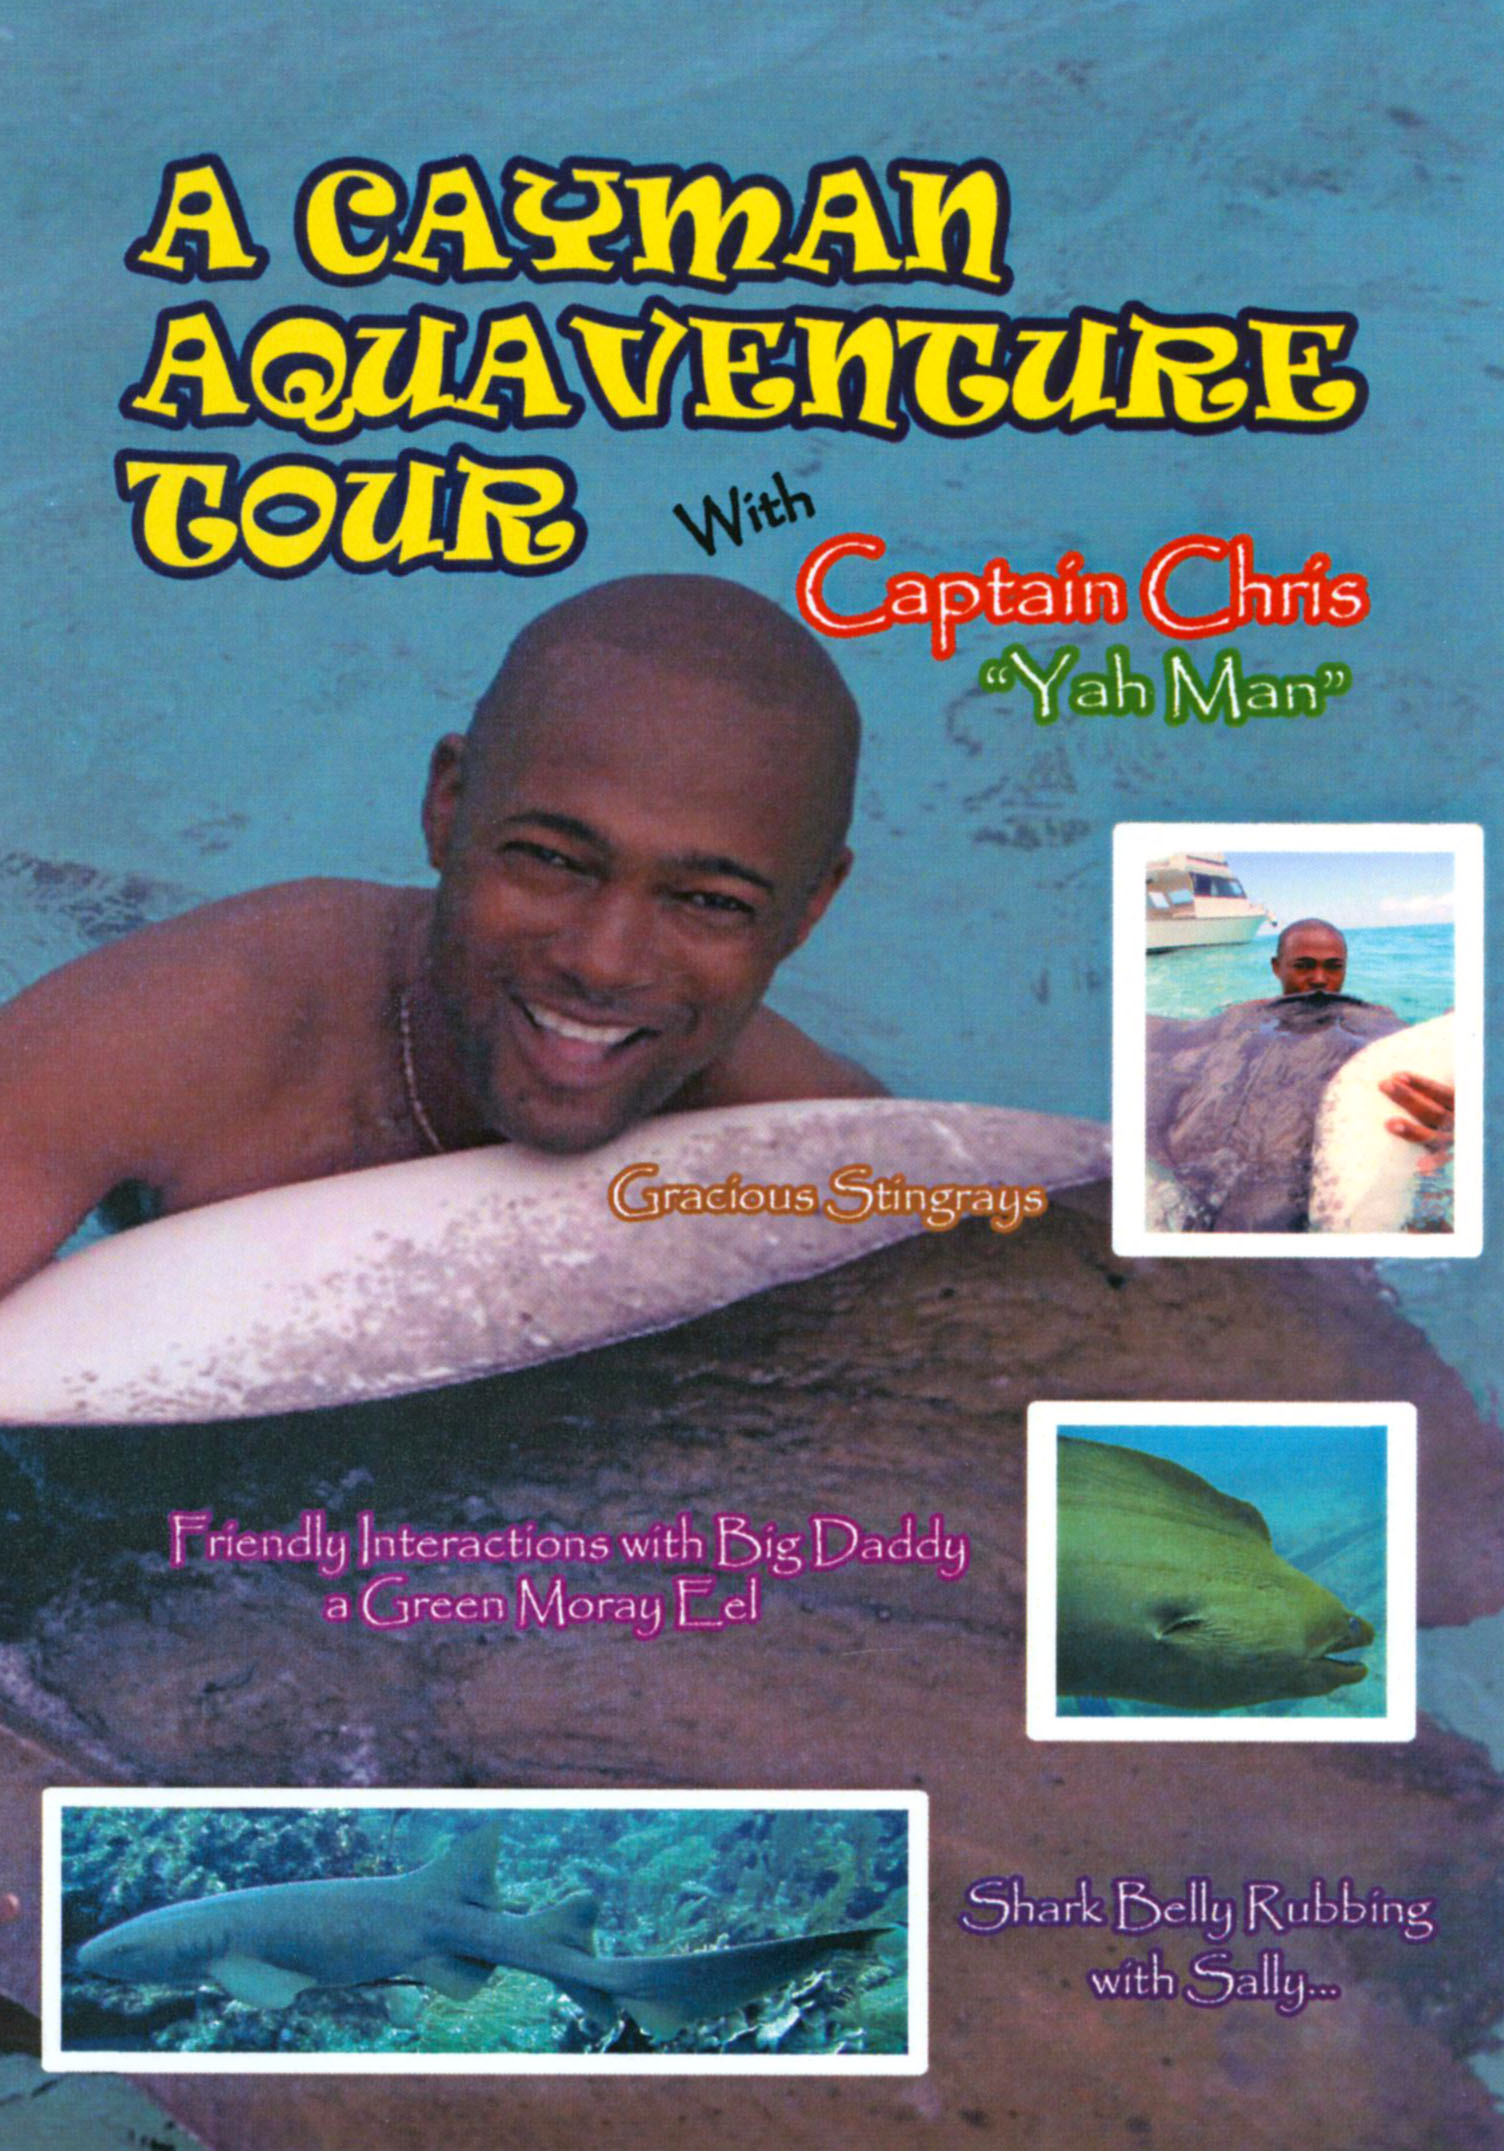 Cayman Aquaventure Tour